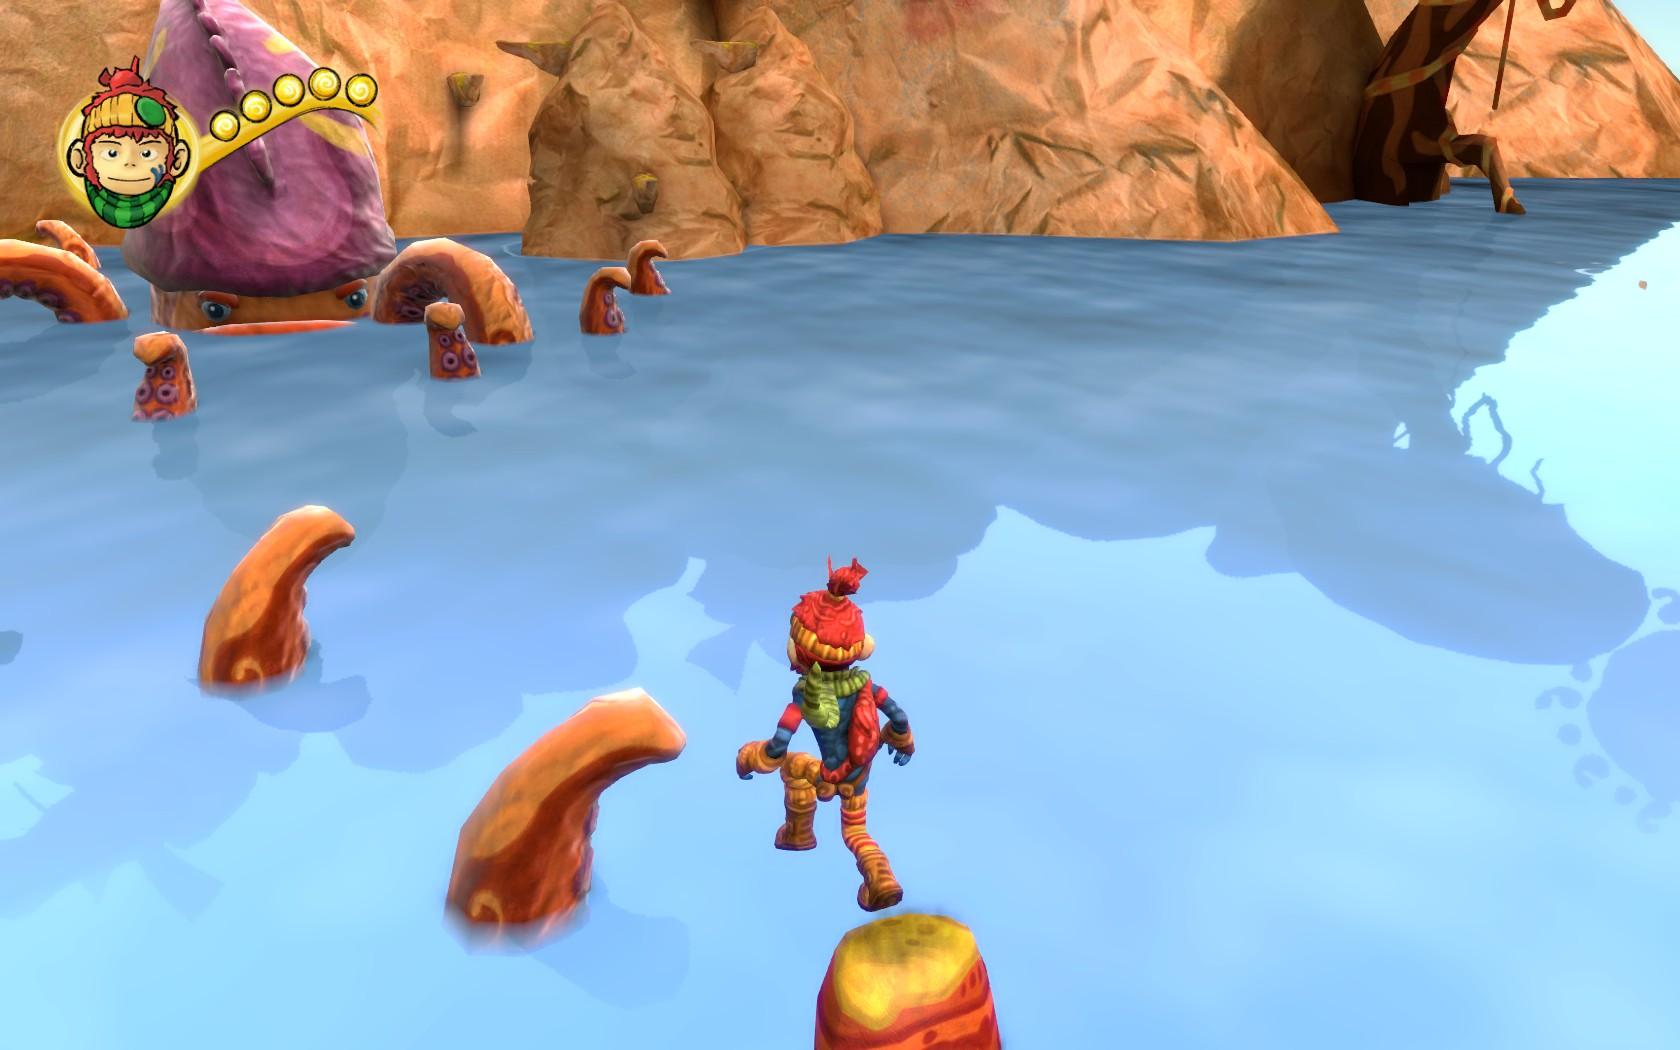 The Last Tinker Koru Jumping